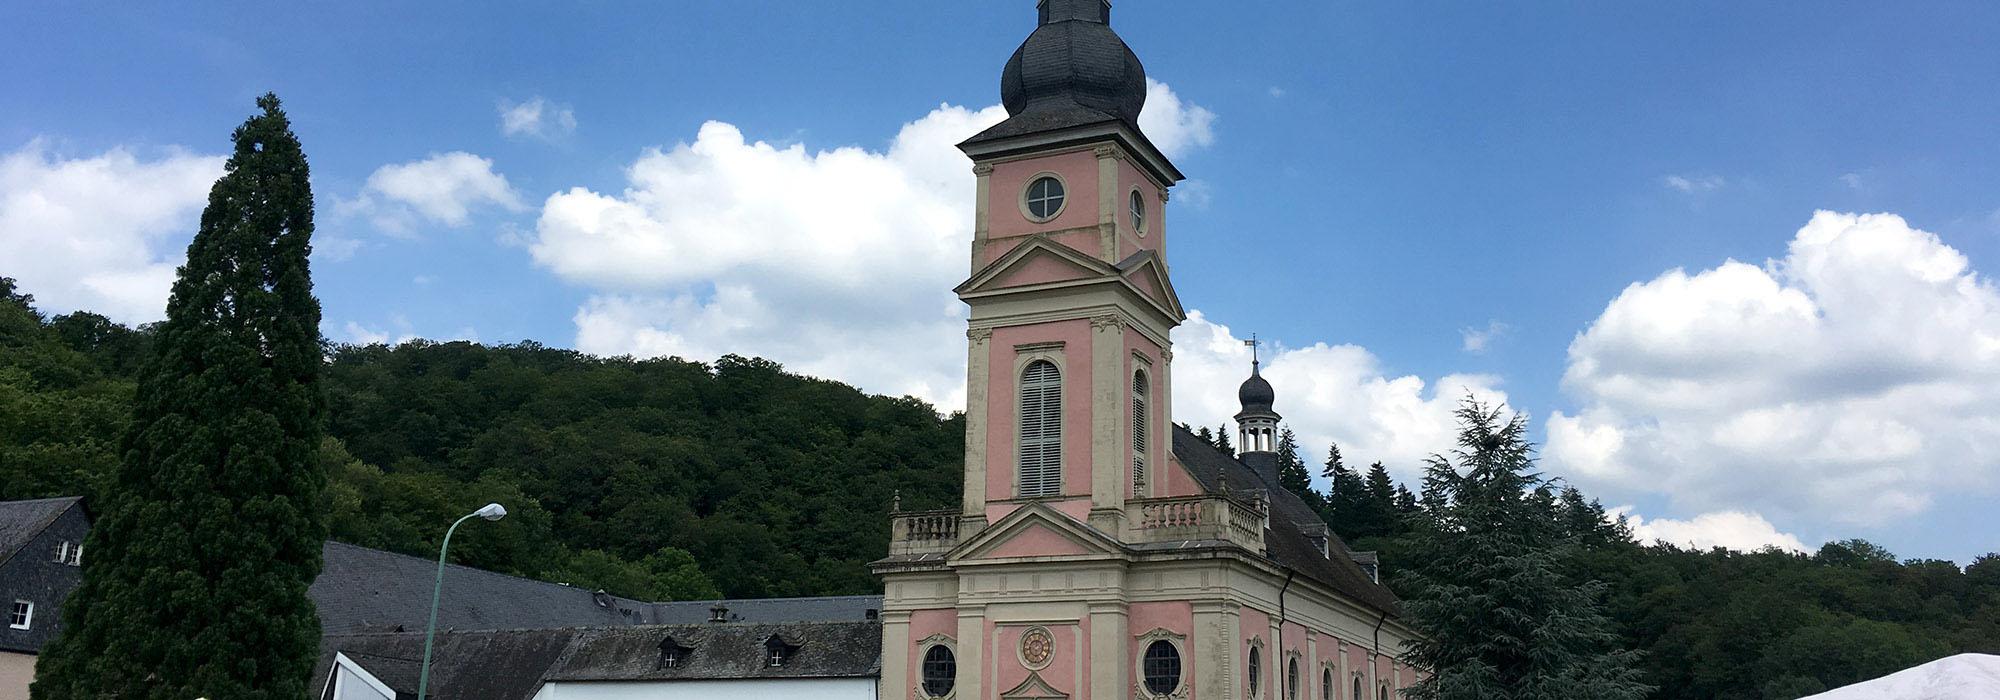 Springiersbach-IMG_1595